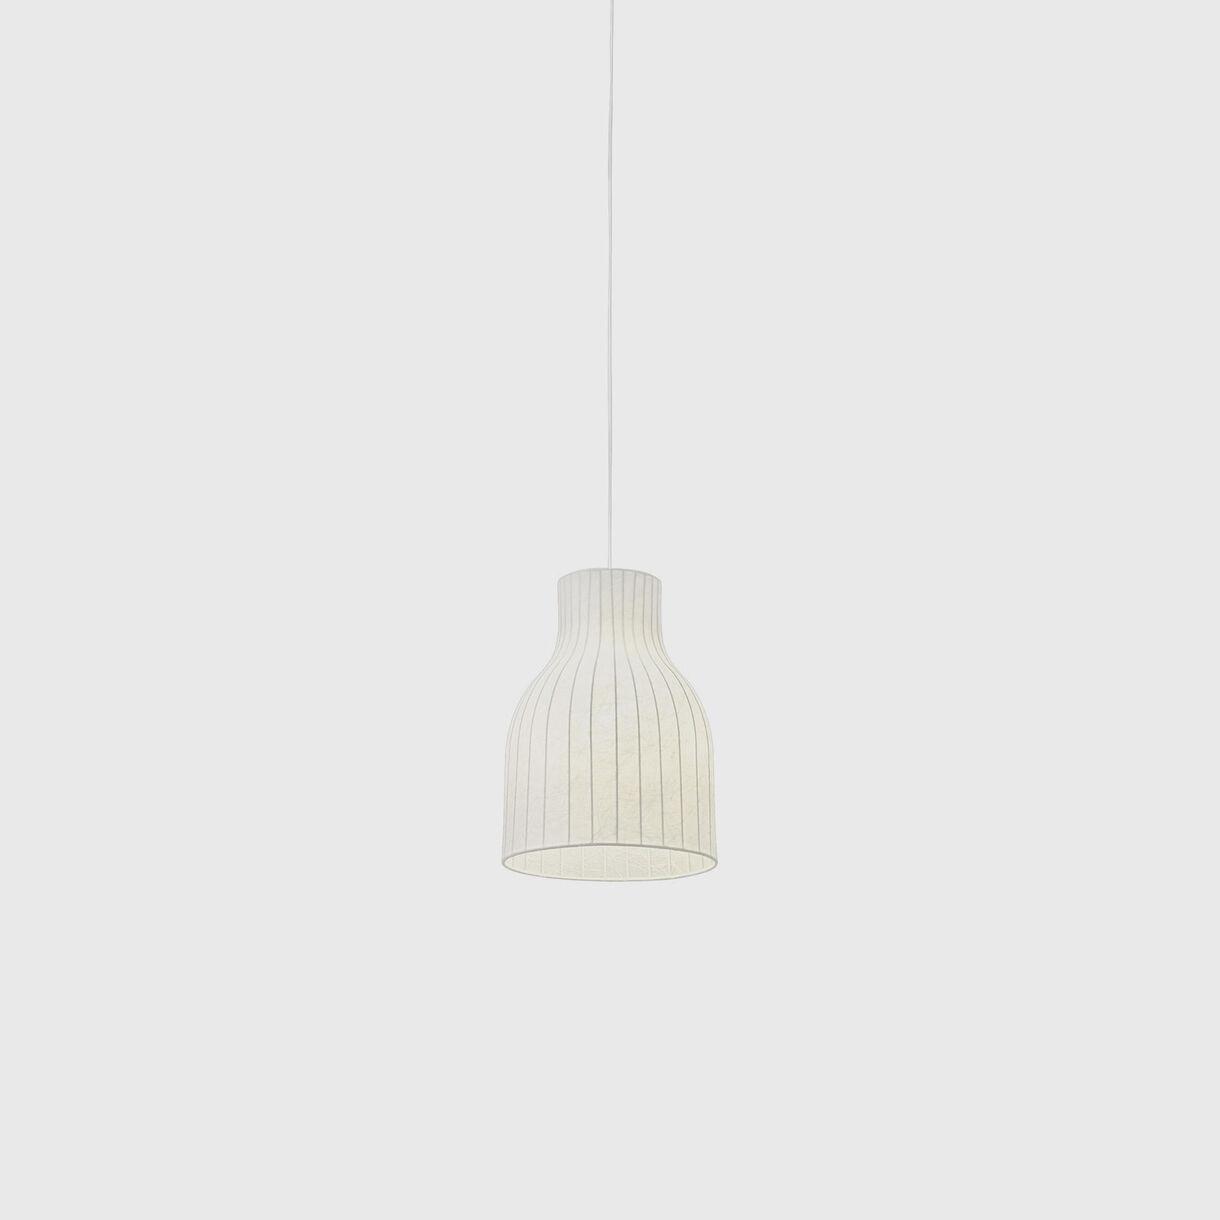 Strand Pendant Lamp, Open, Small